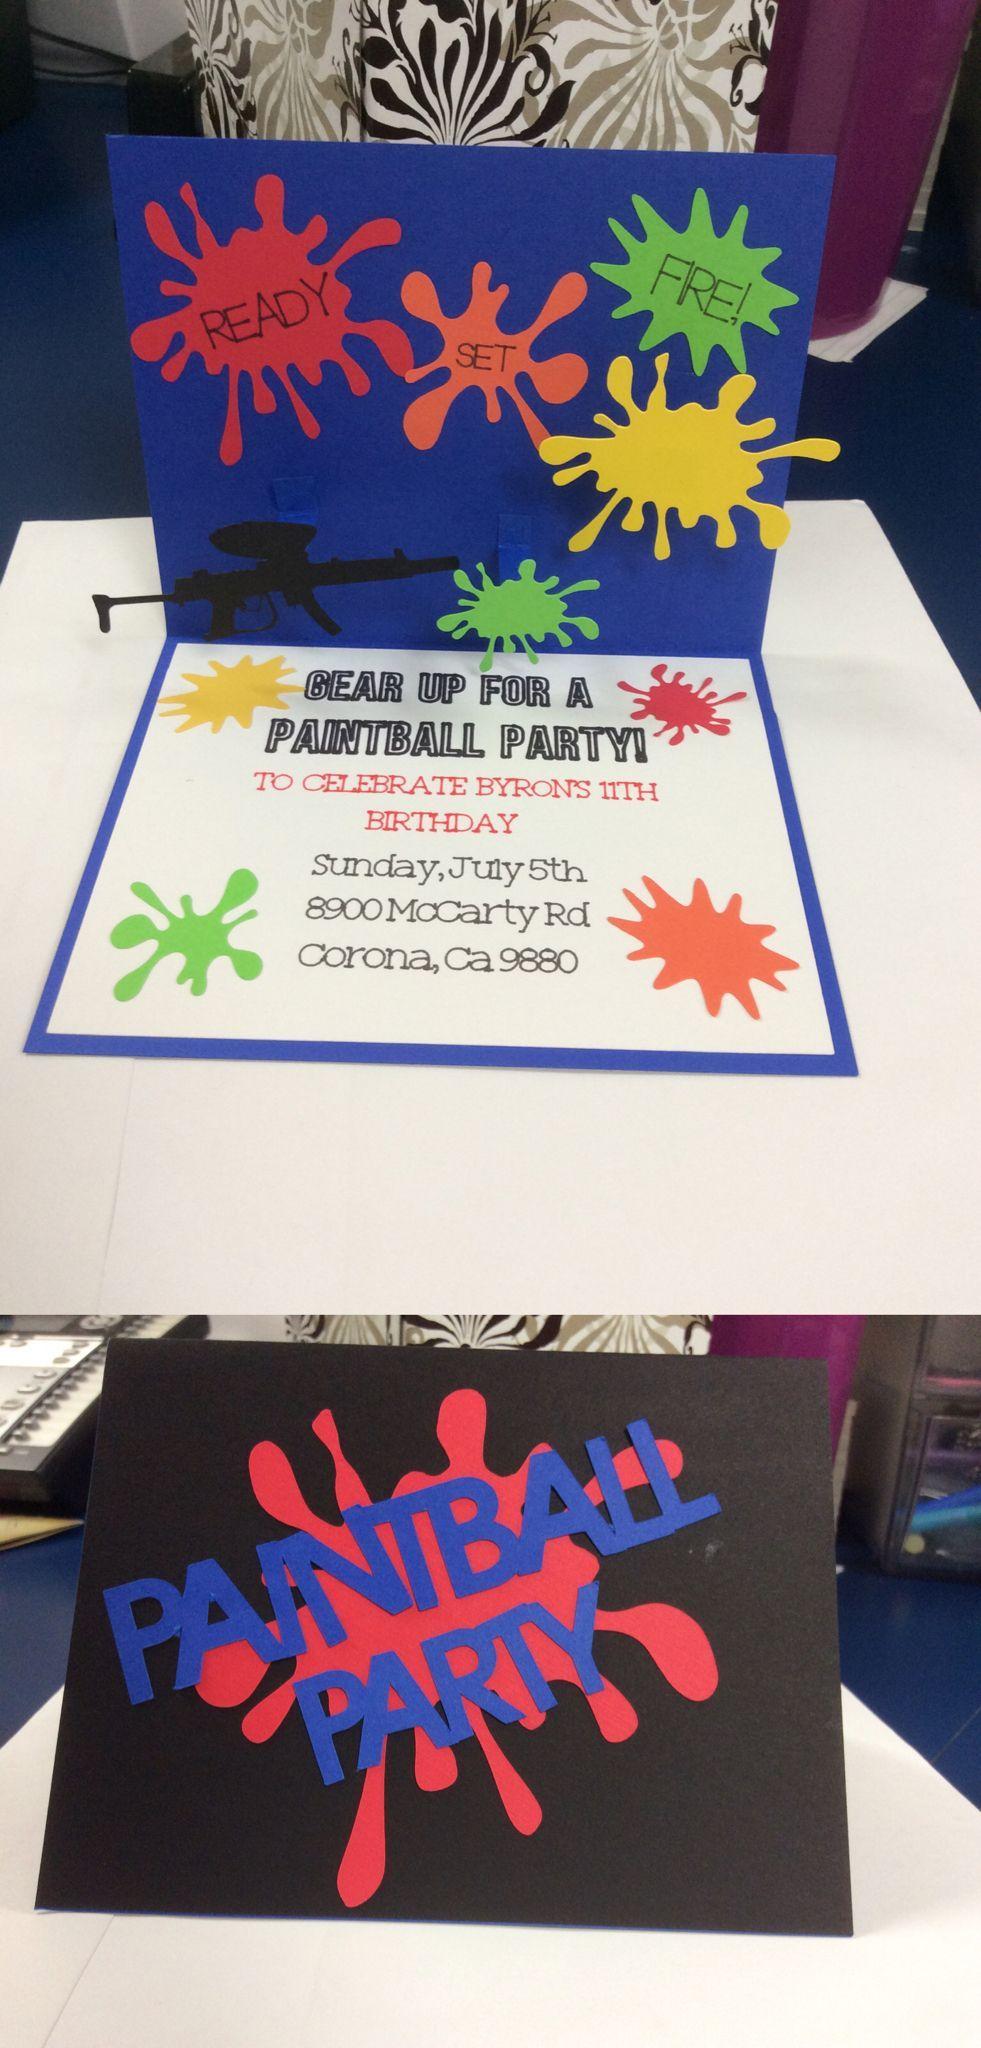 Paintball Theme Invitations Birthdayinvitation Handmade Paintball Birthday Paintball Birthday Party Paintball Party